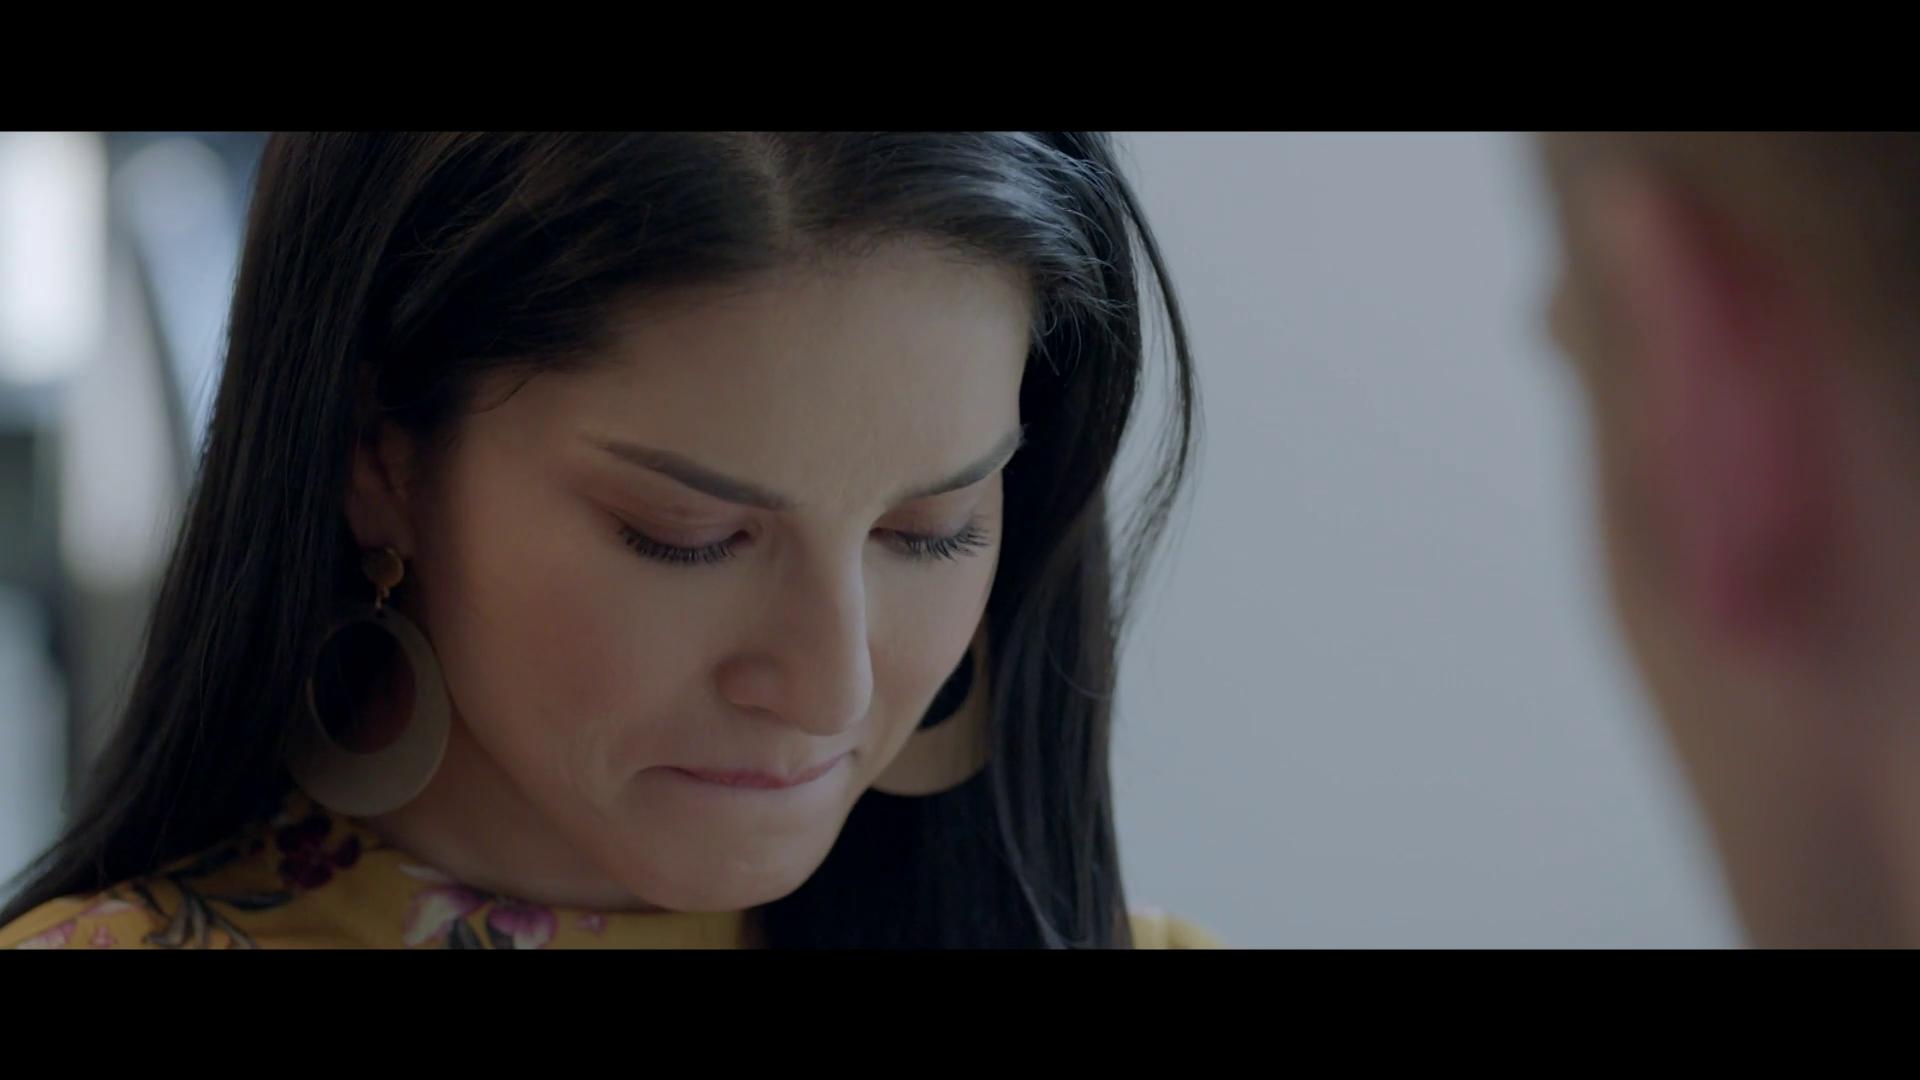 Karenjit Kaur The Untold Story of Sunny Leone S02 1080p WEB-DL H264 AAC2.0 ESubs-IcTv